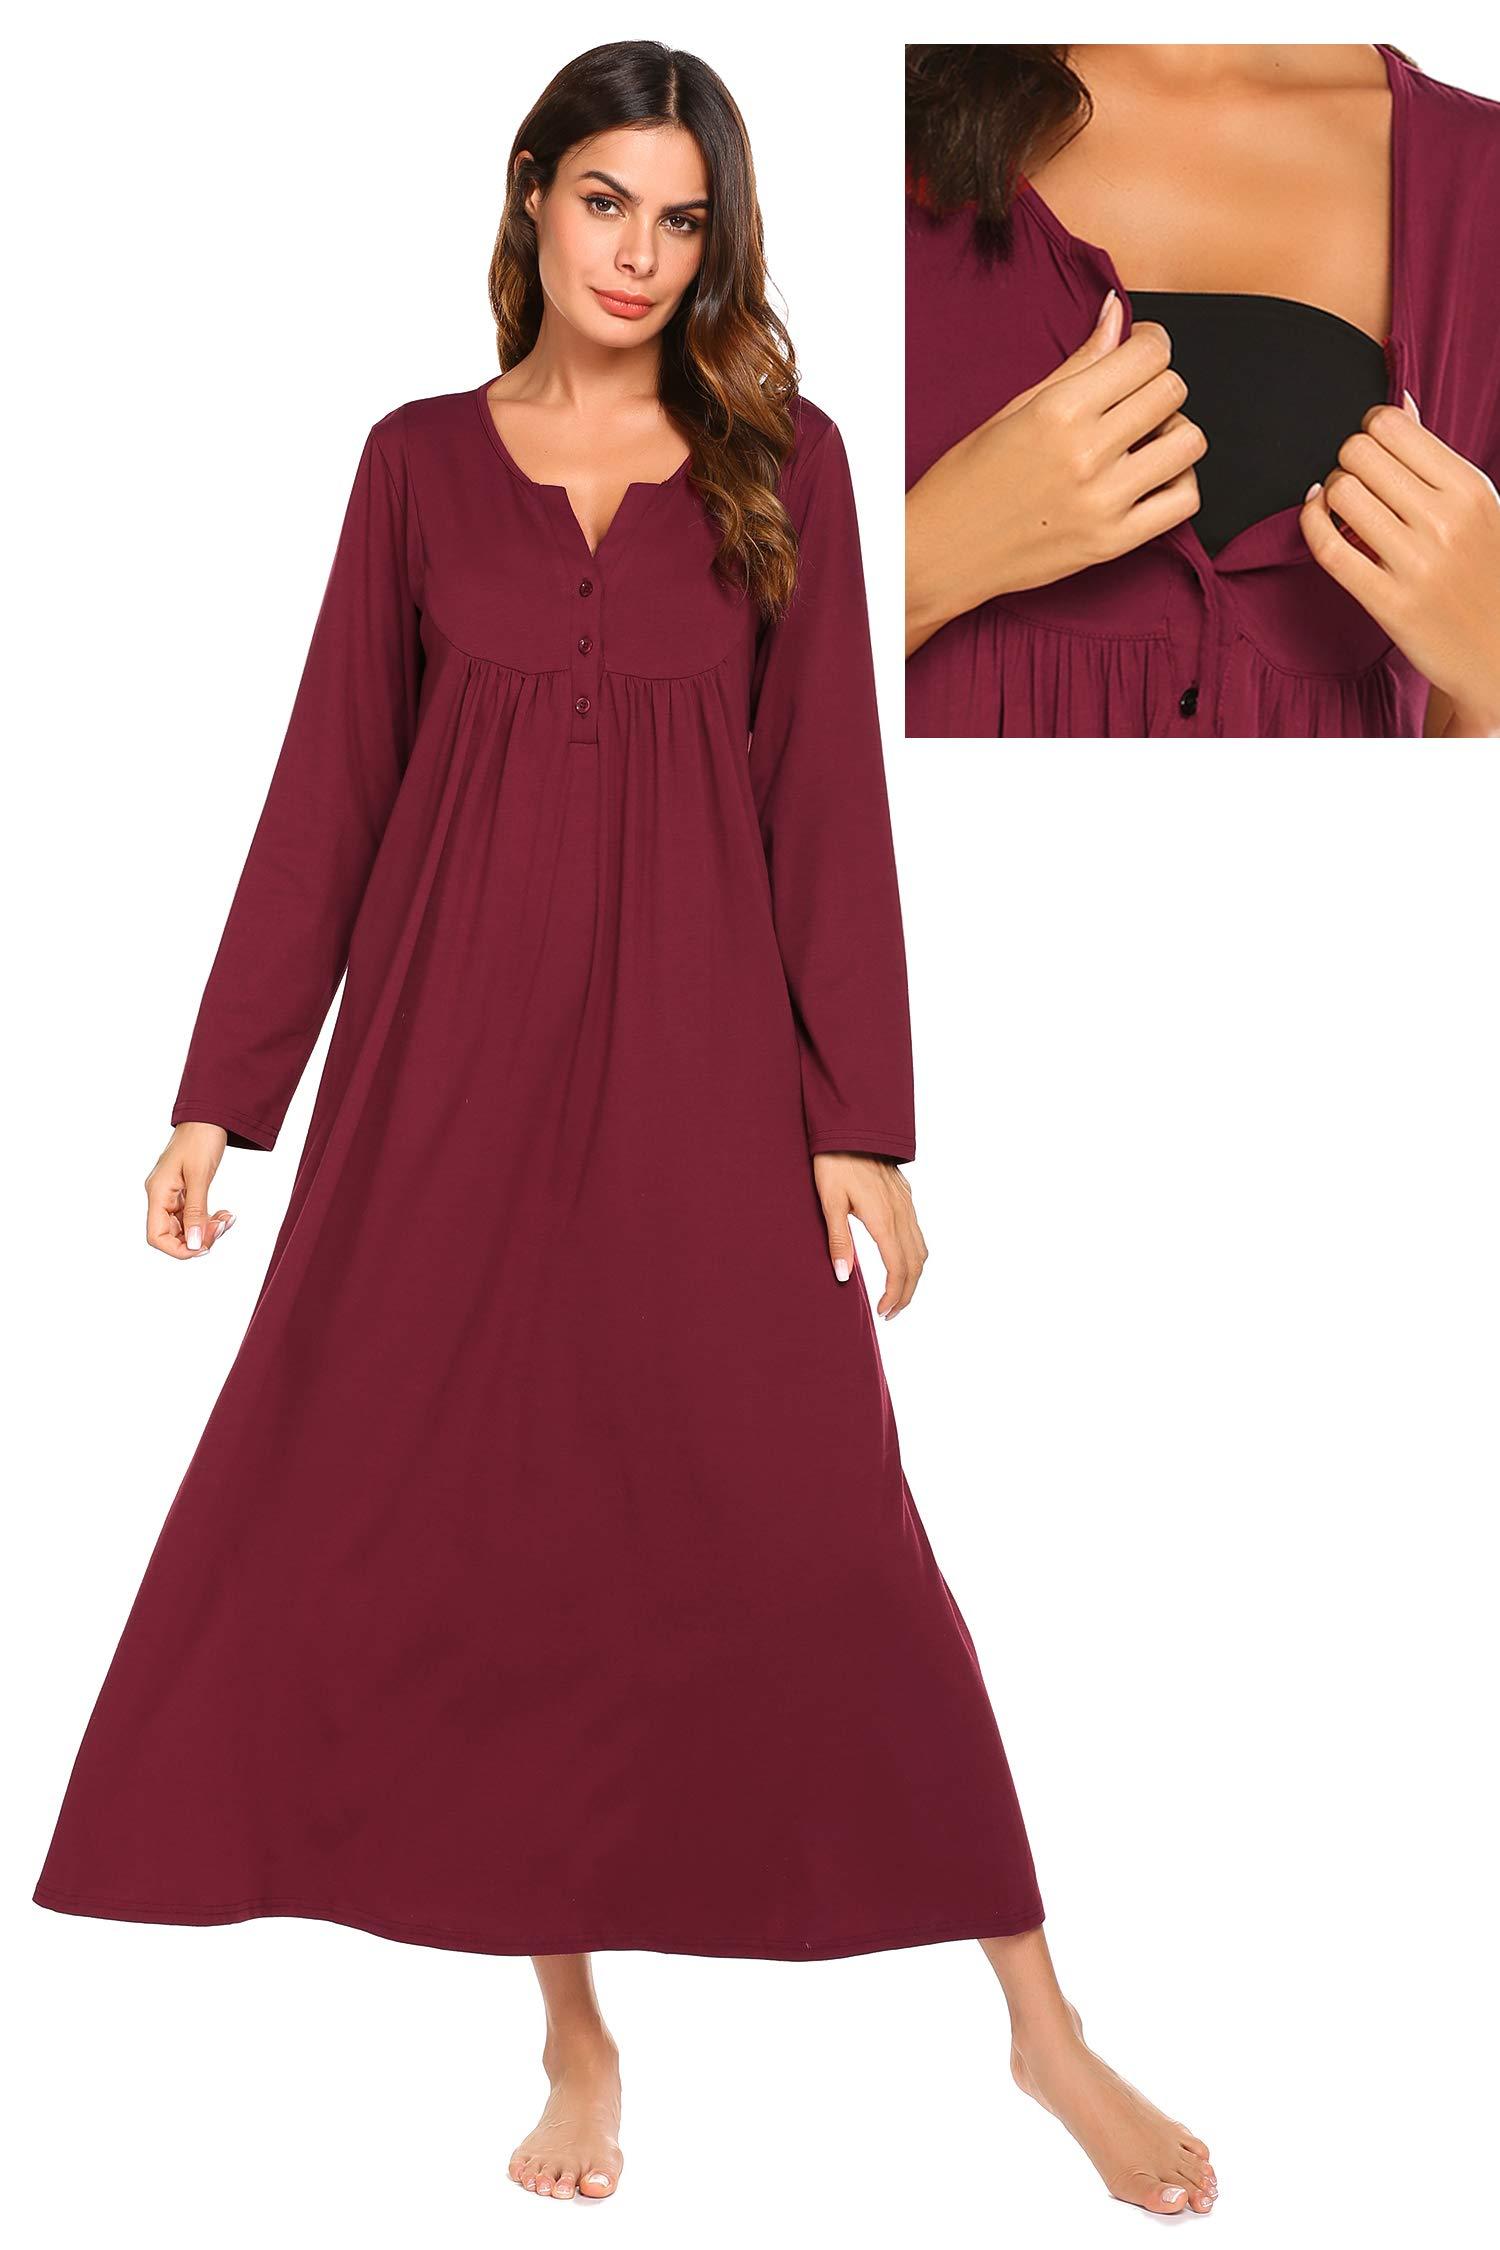 Ekouaer Maternity Nursing Dress,Breastfeeding Nightgown Sleepwear (Wine Red, XX-Large)